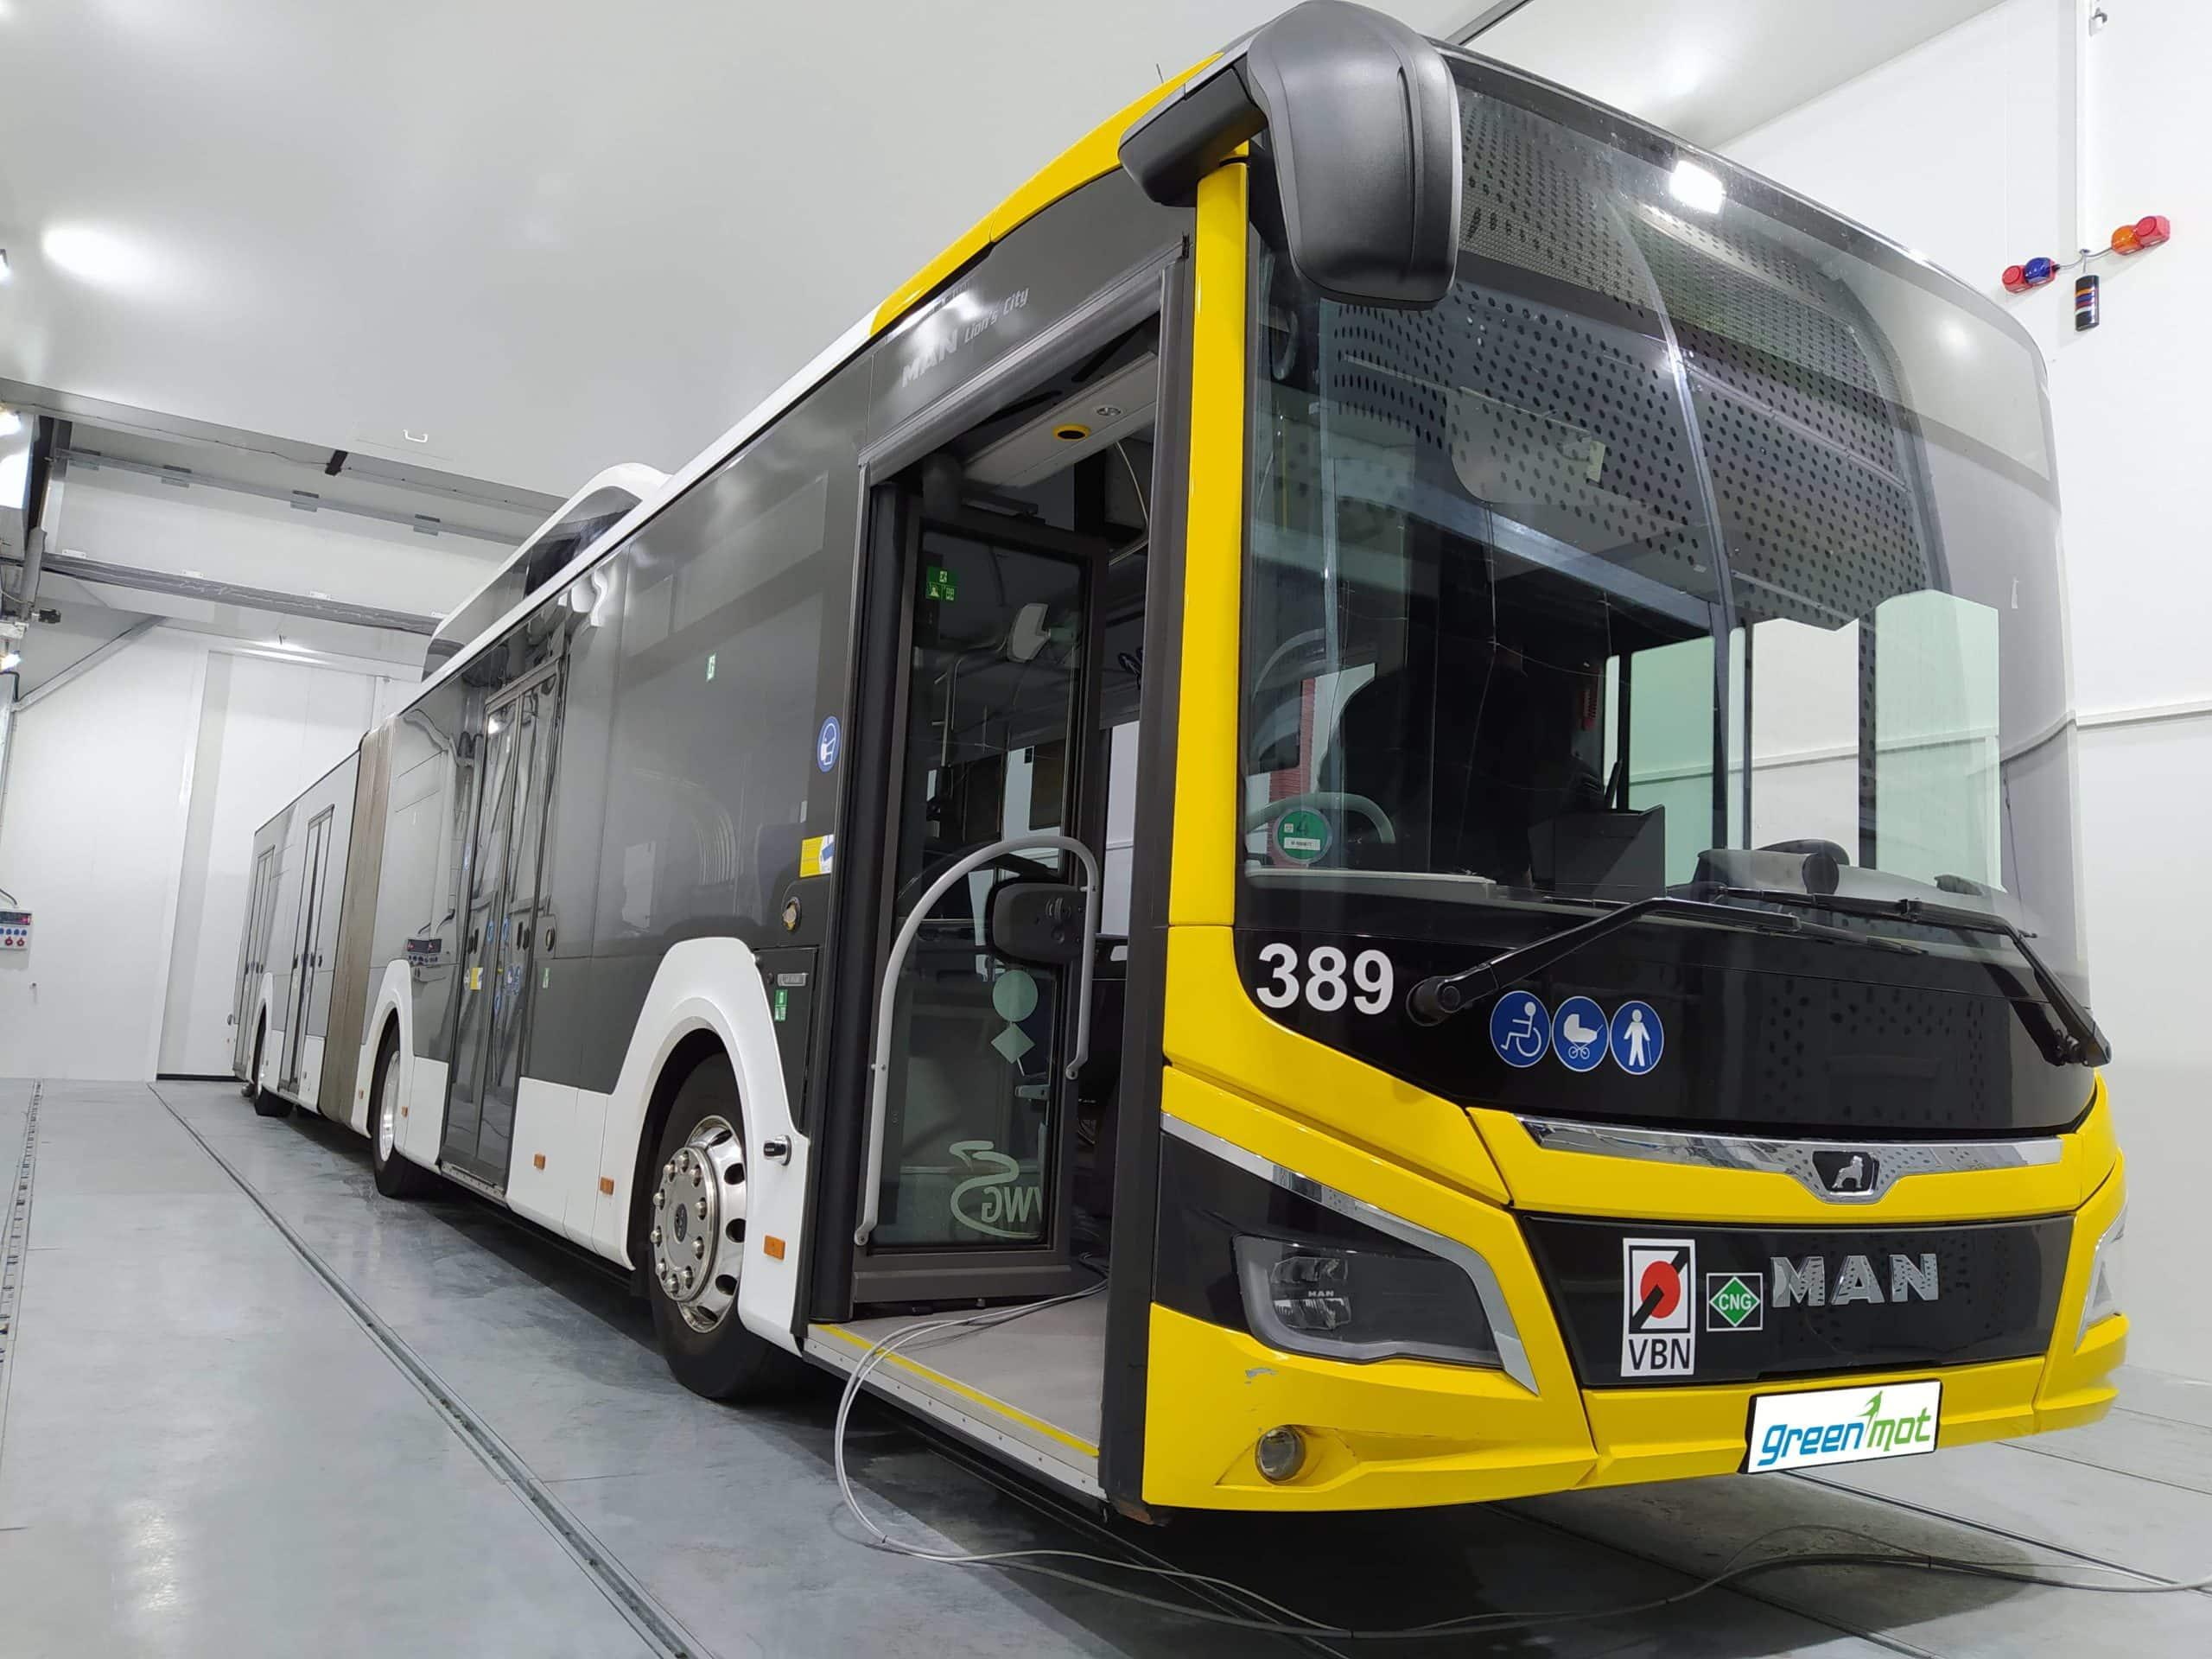 MAN bus 18m high power test cell